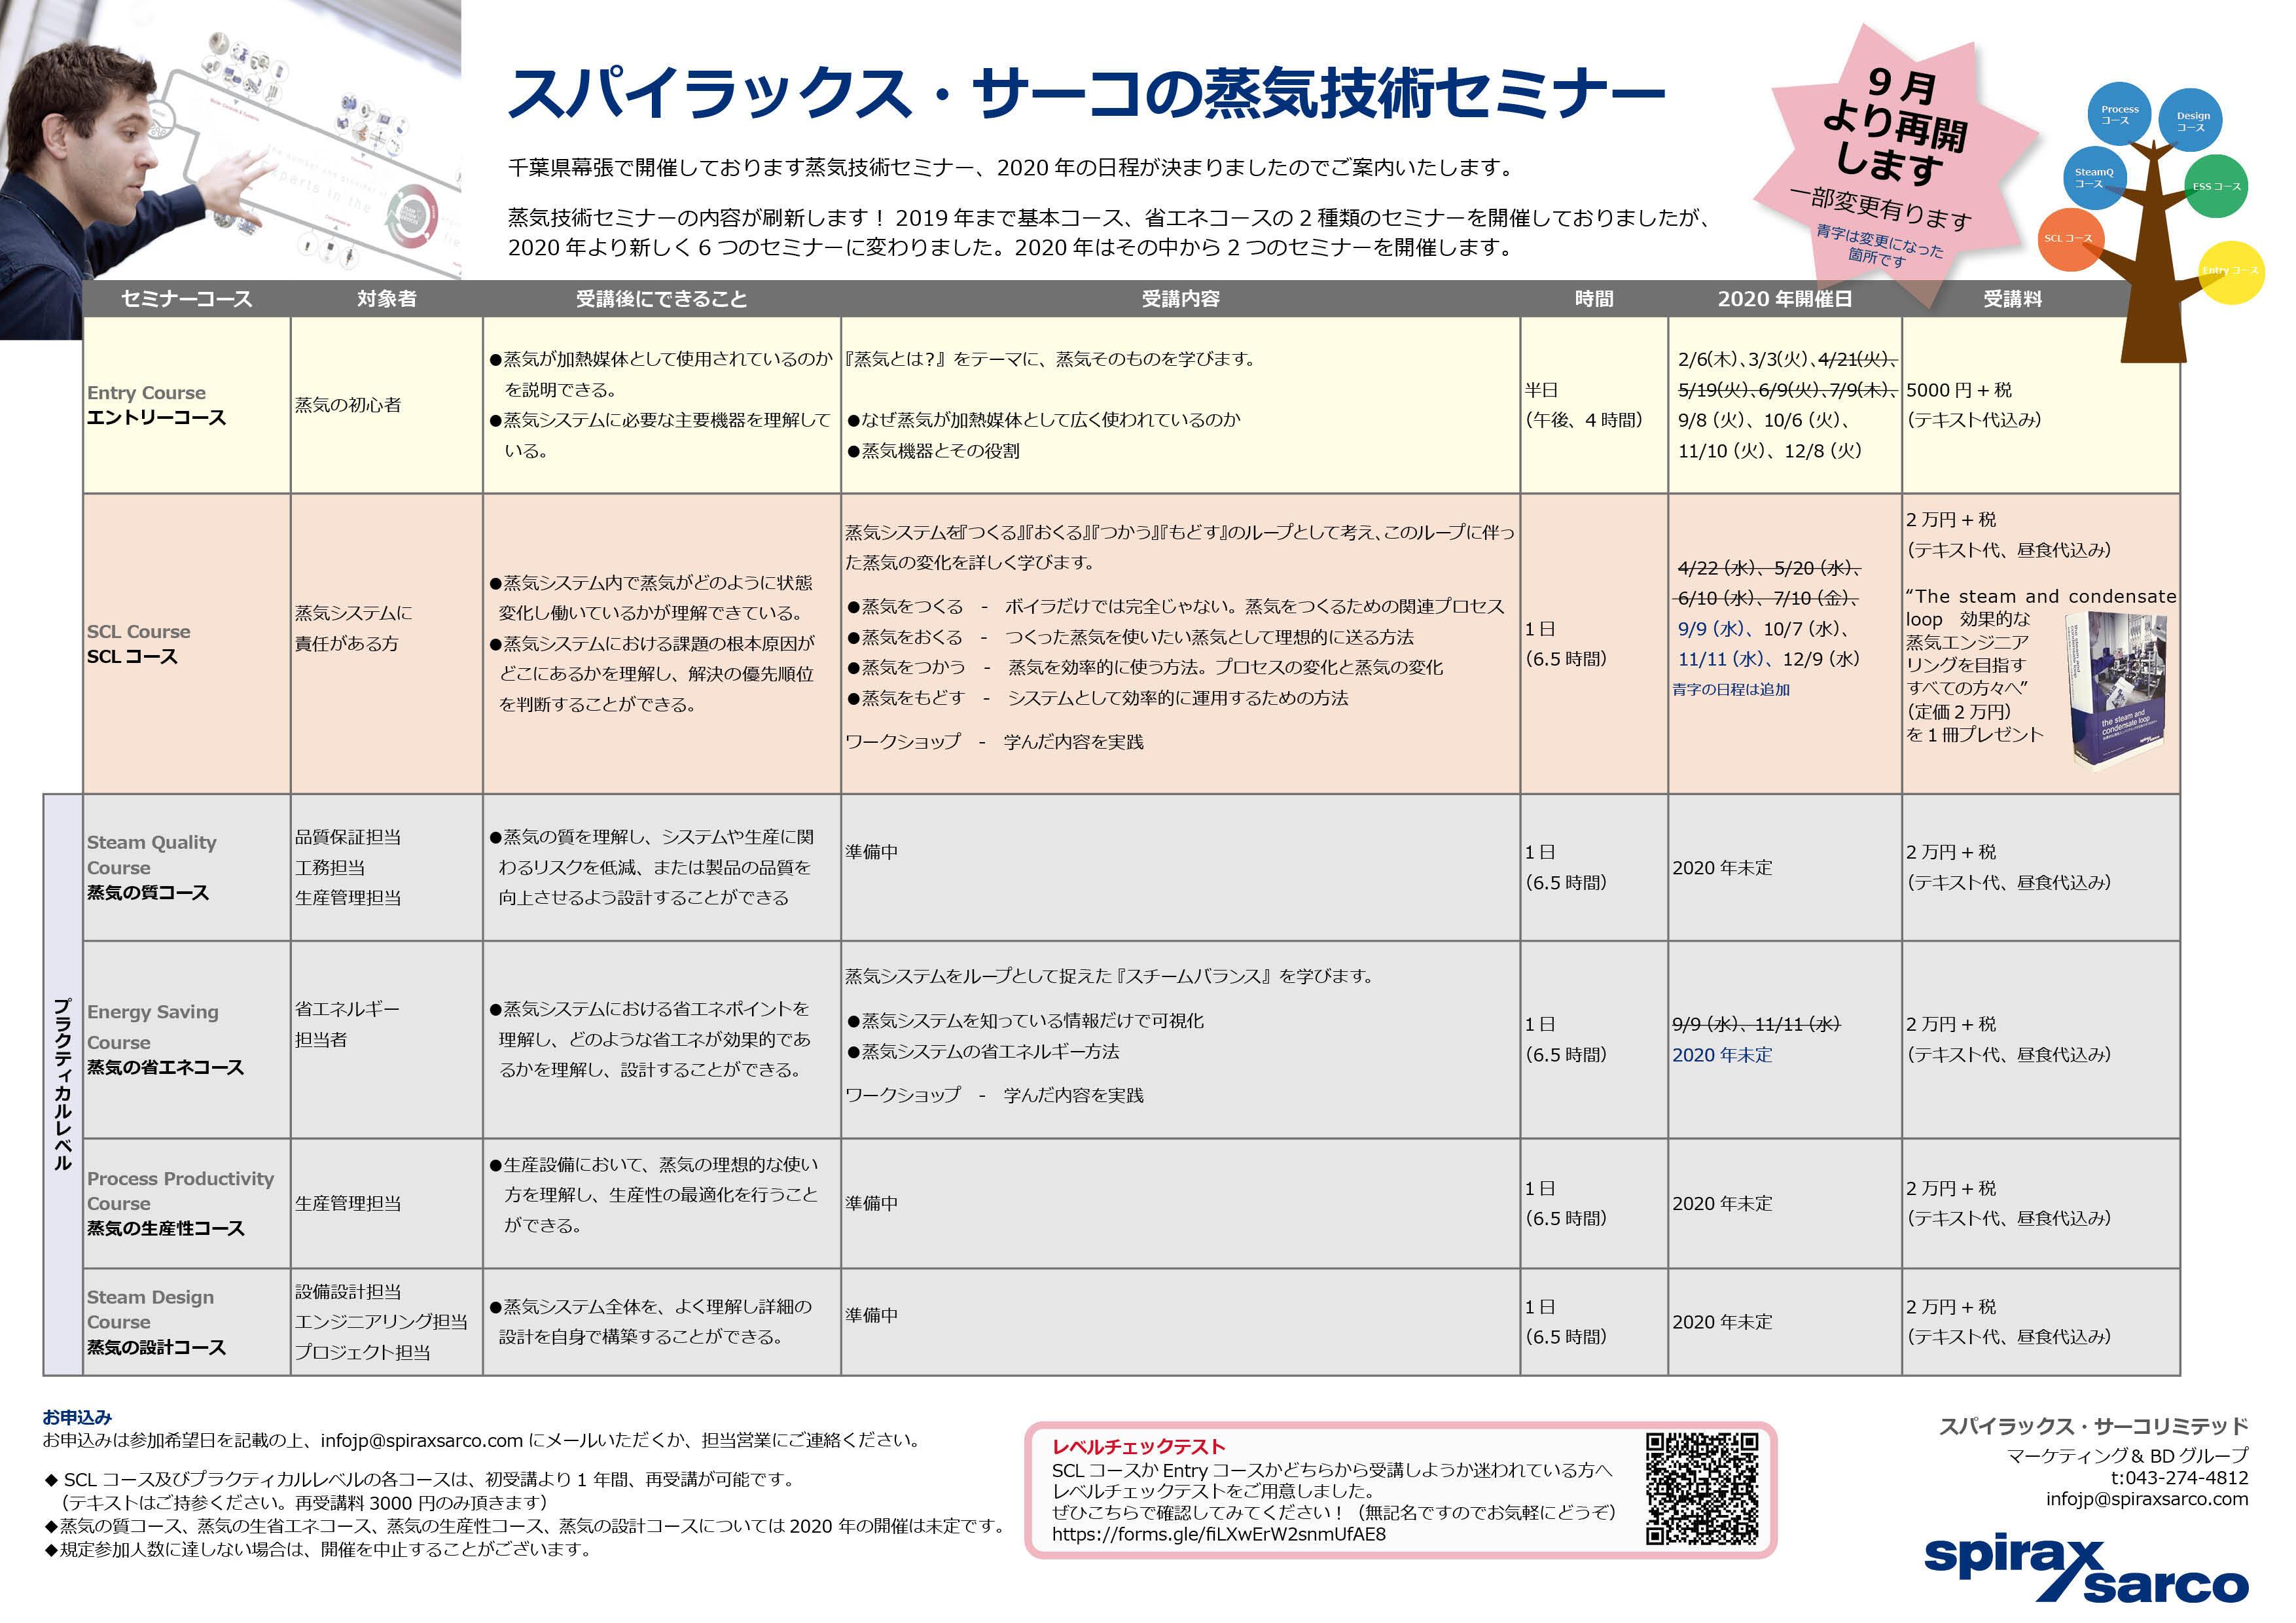 https://spiraxsarco.co.jp/blog/mt/blog/c6607b823b02c5c7ac937b155d40a754c51fa65d.jpg